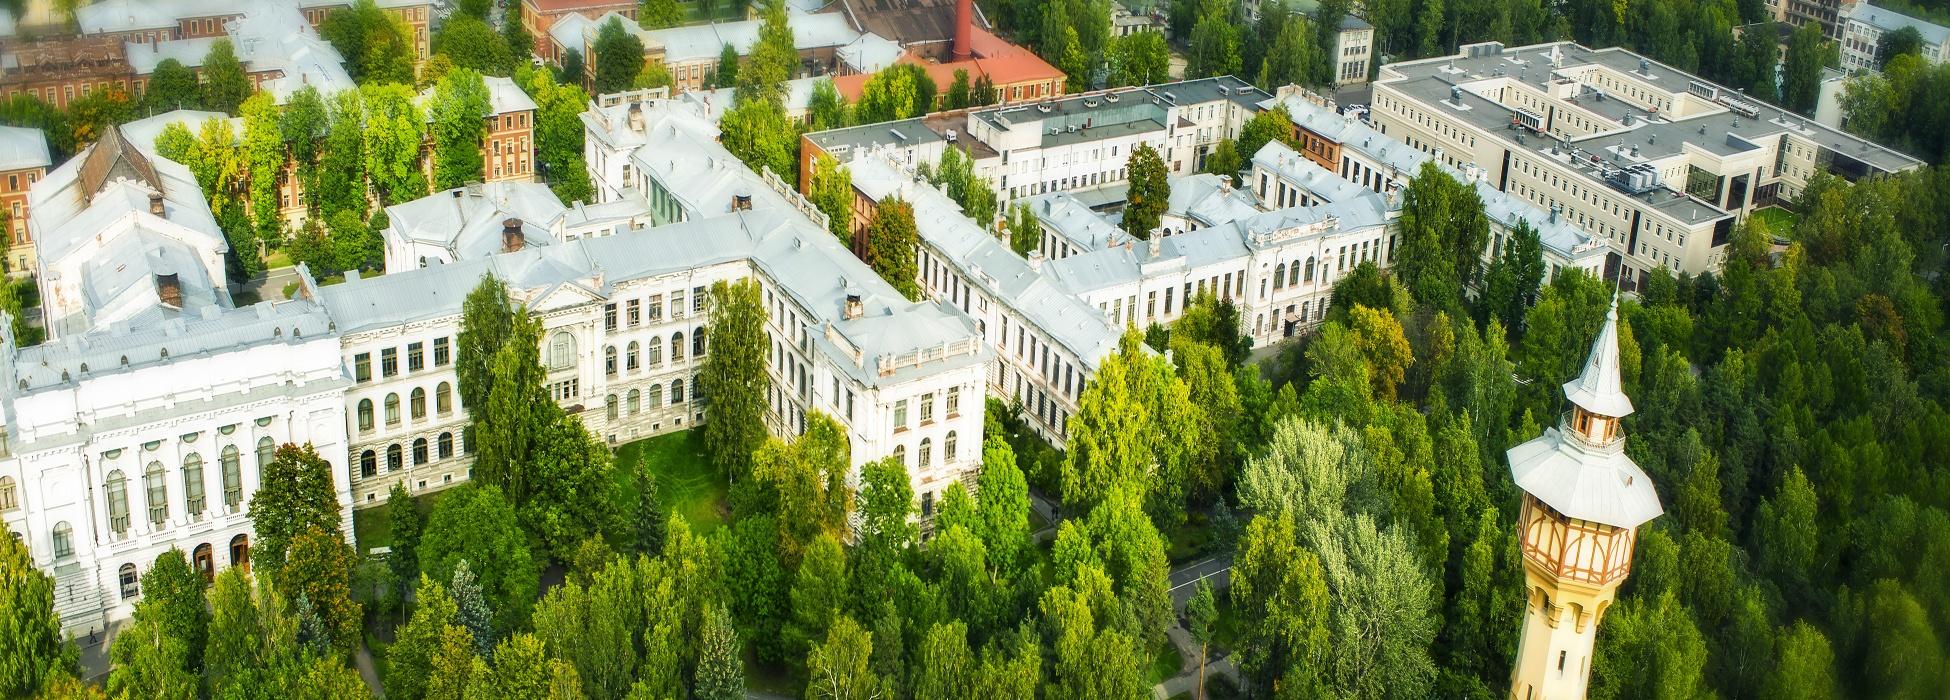 studentvisa-ir-peter-the-great-st-petersburg-polytechnic-university-aeriel-view